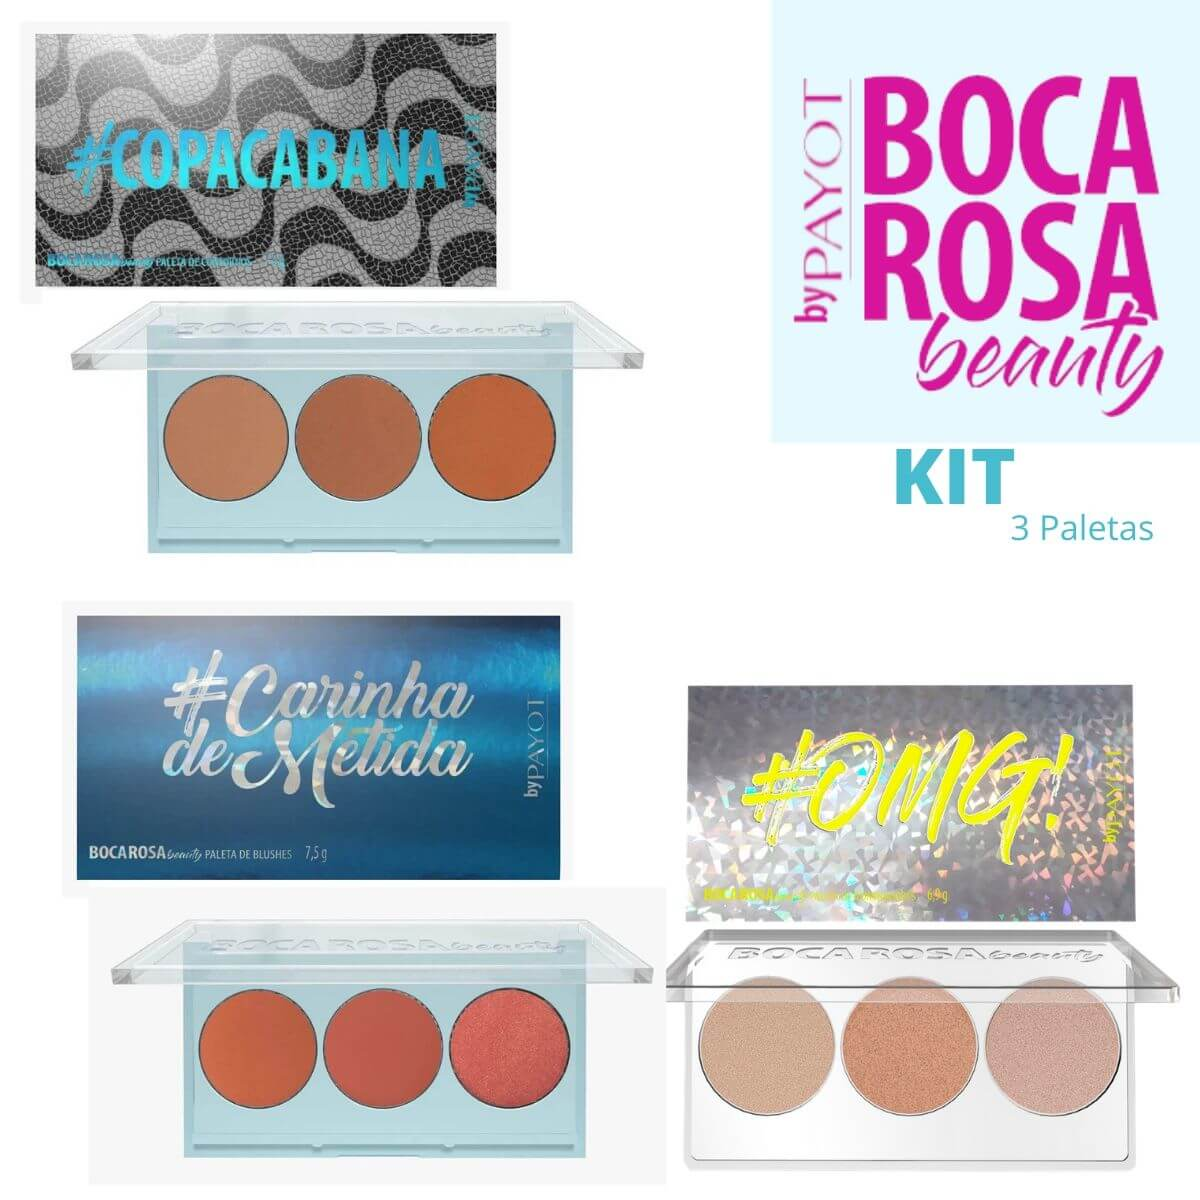 Kit 3 Paletas - Boca Rosa - Contorno, Blush, Iluminador